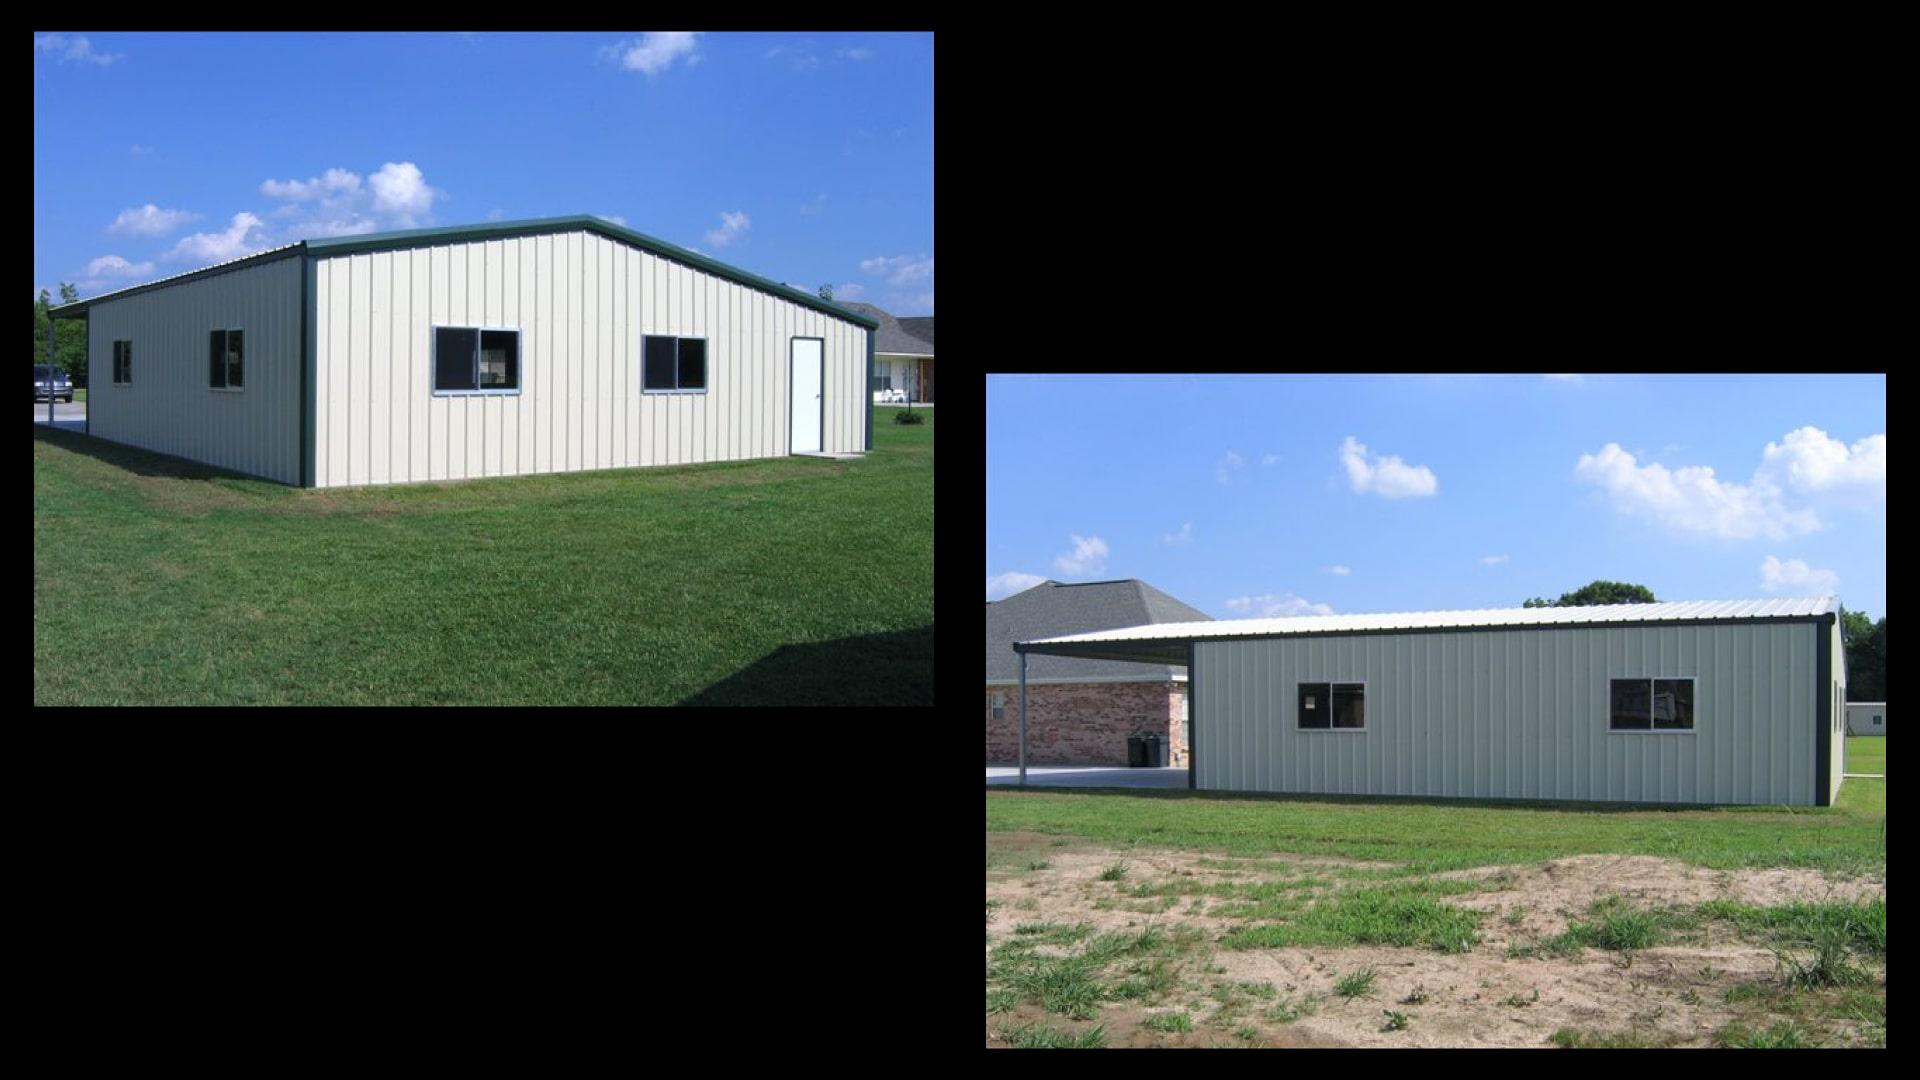 Gable asymmetrical tan metal garage kit with green trim, inset bay, 4 windows and walk door.